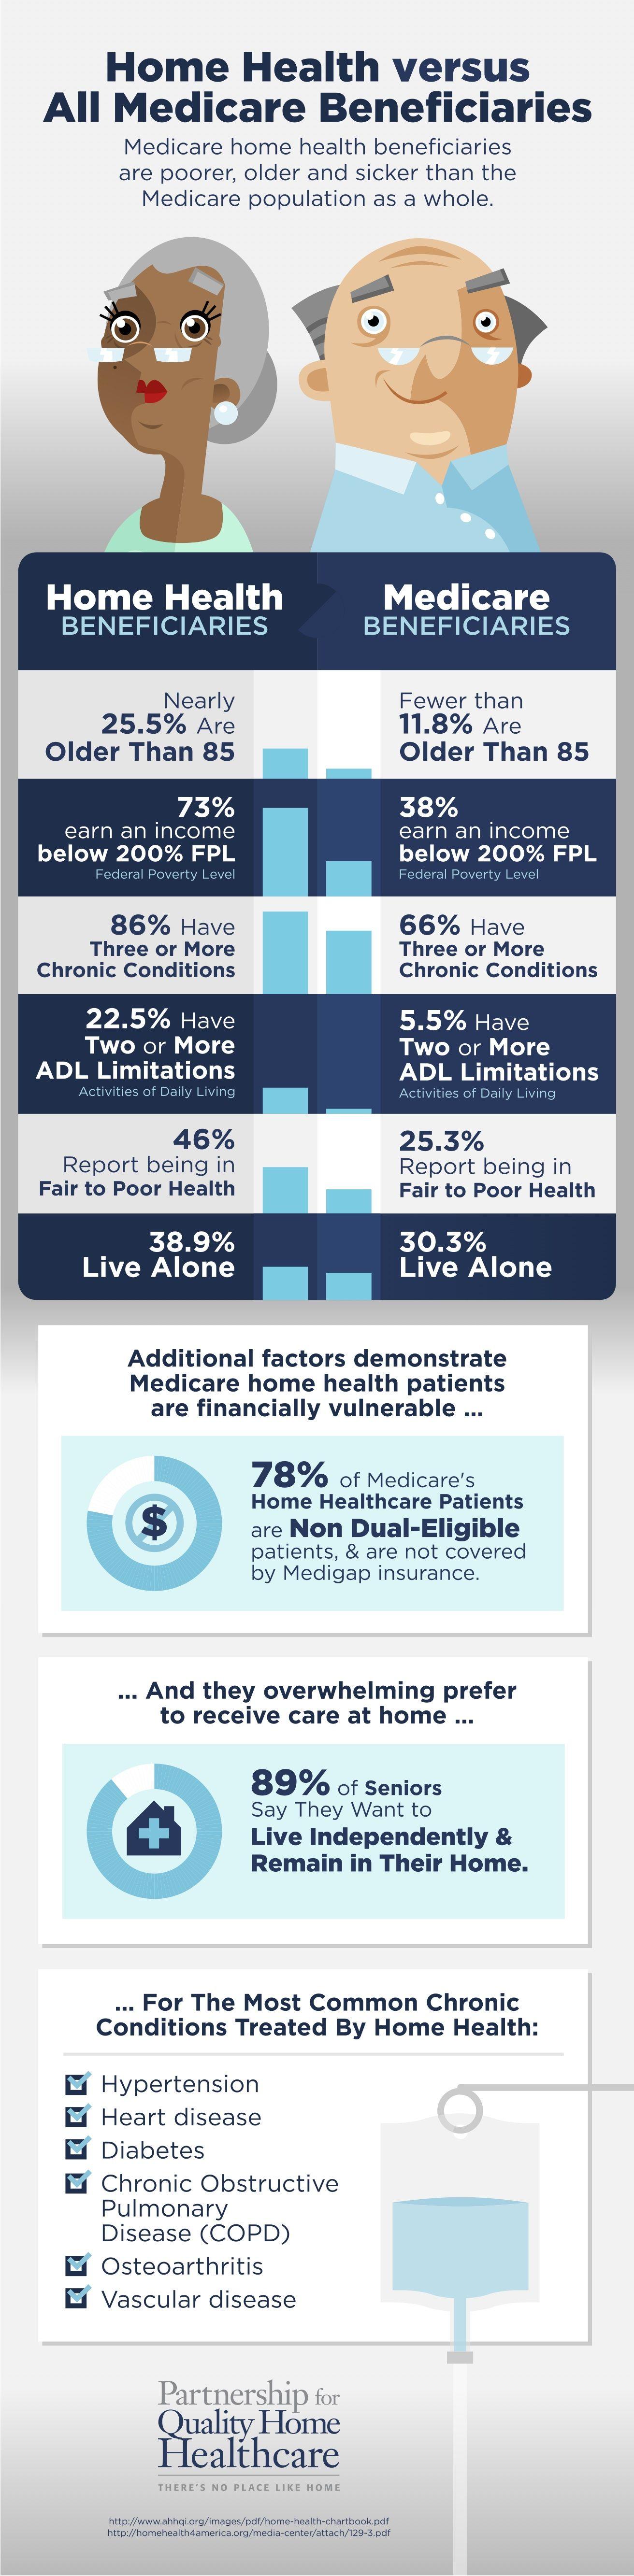 Home Health Patients versus All Medicare Beneficiaries